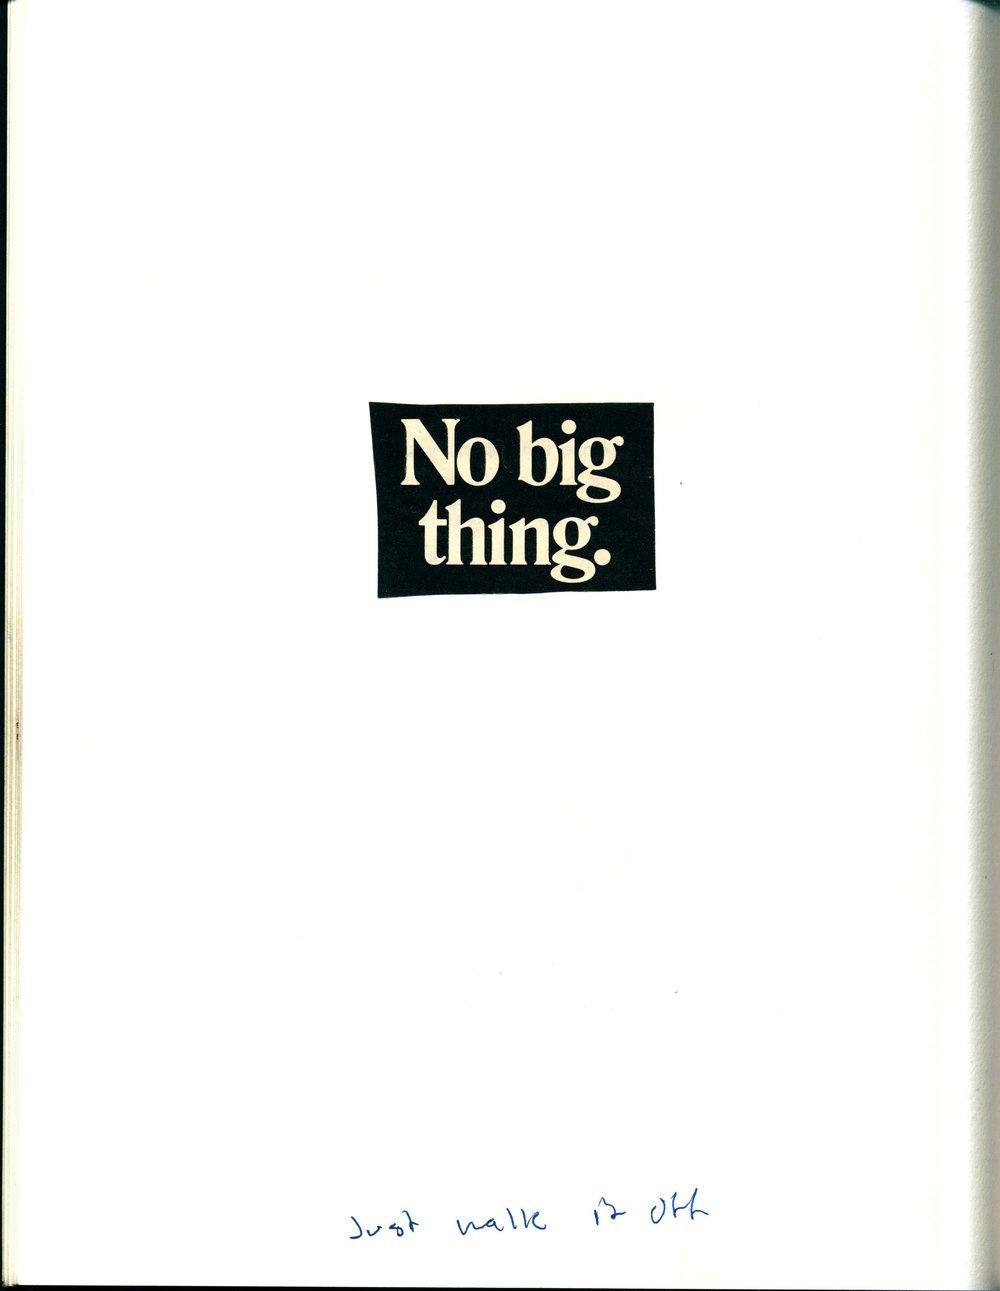 notebook0013.jpg